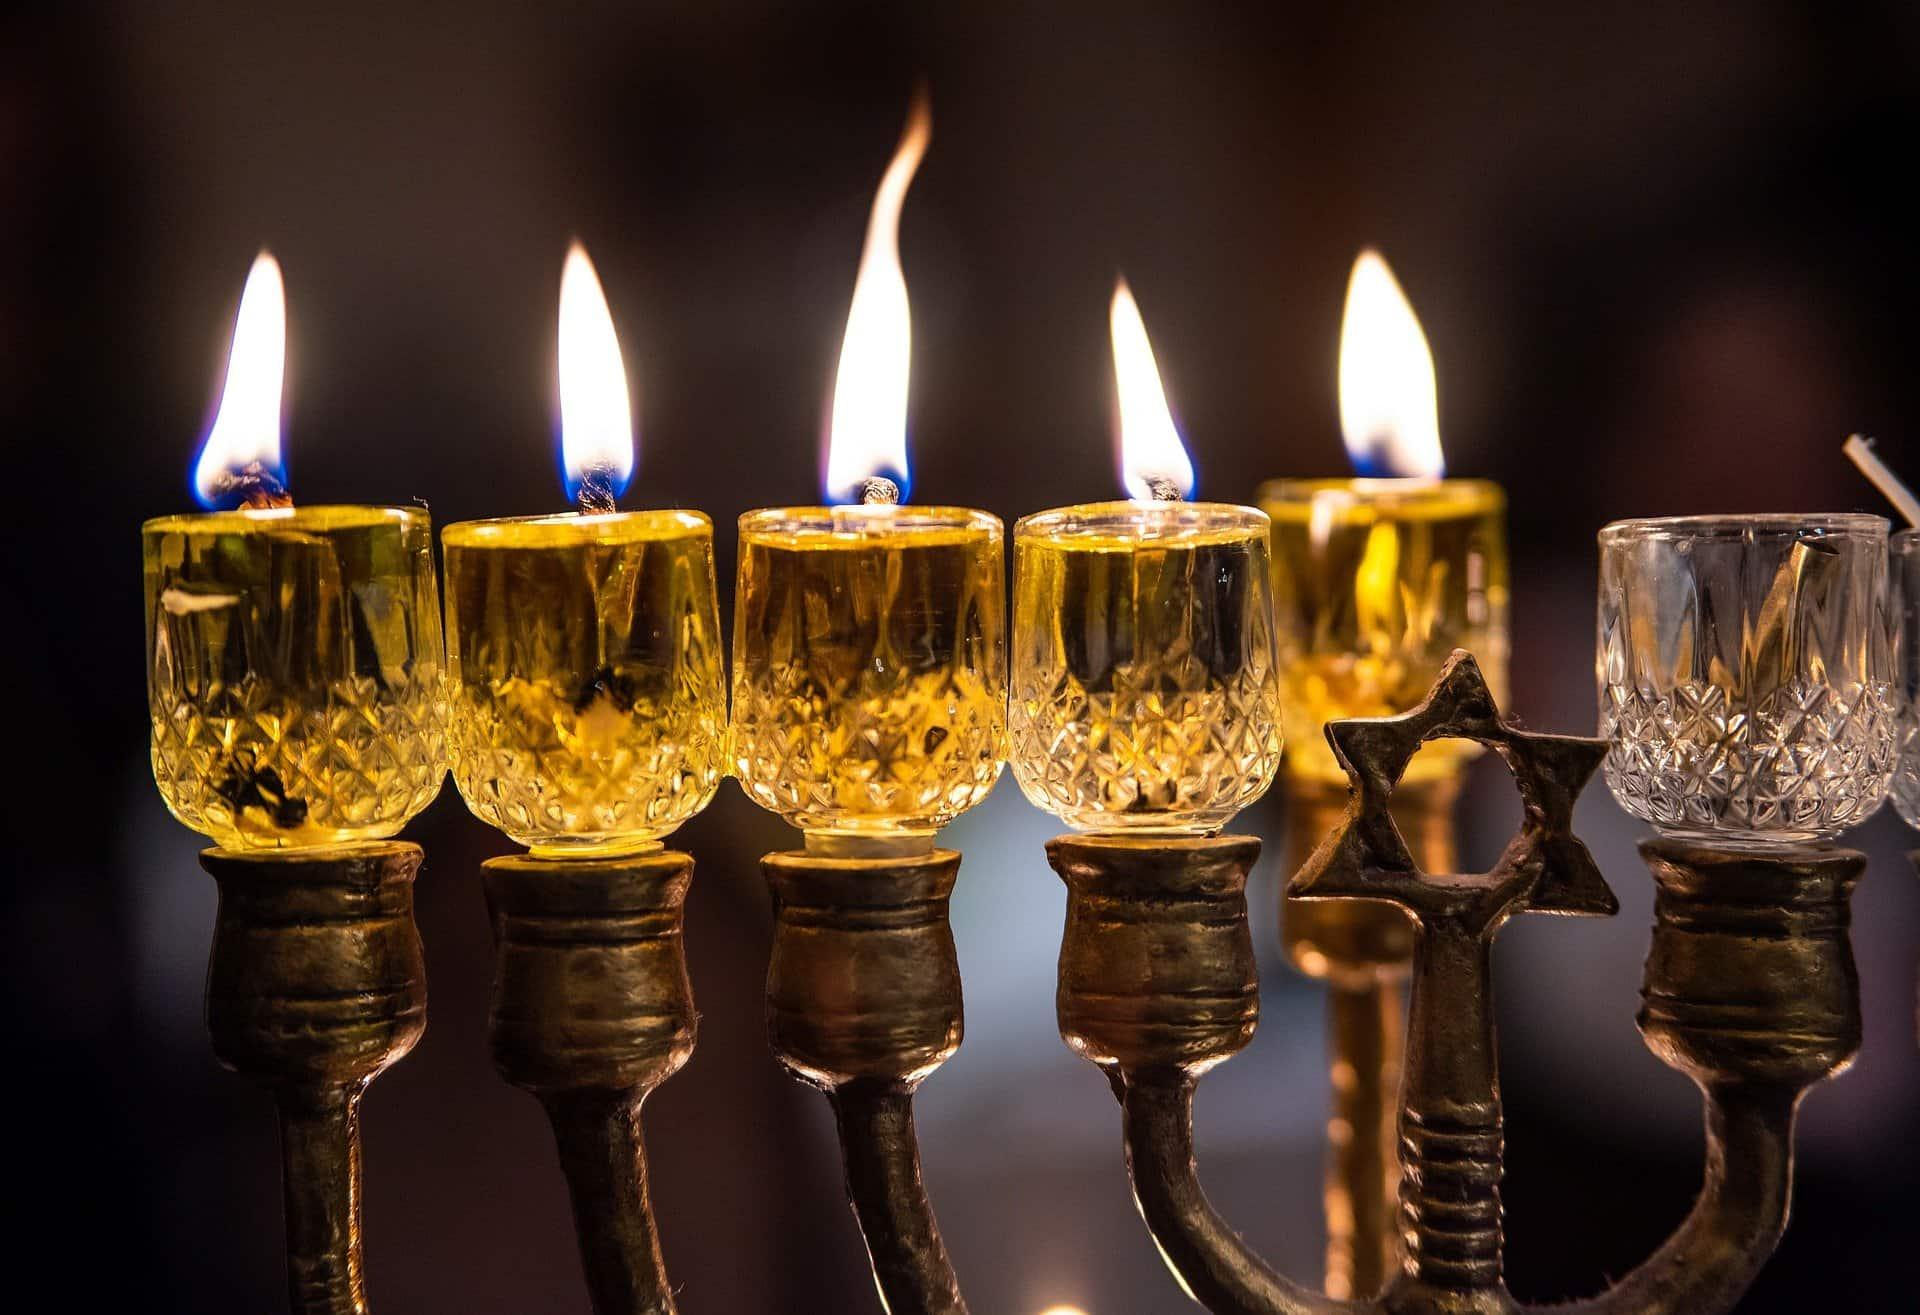 A Hanukkah menorah. Photo for illustrative purposes.